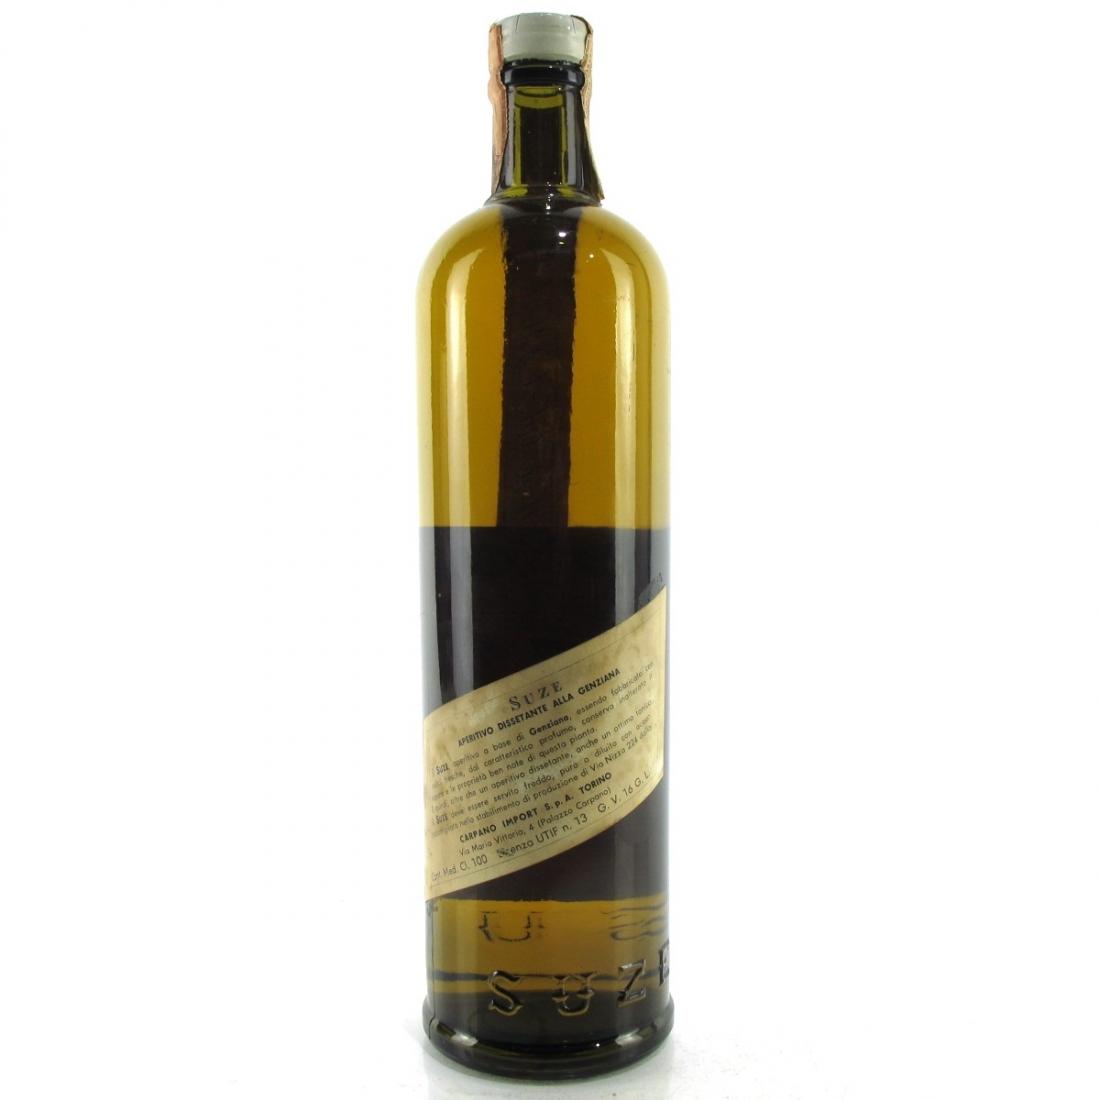 Pernod Suze a la Gentiane 1960s / Rinaldi Import